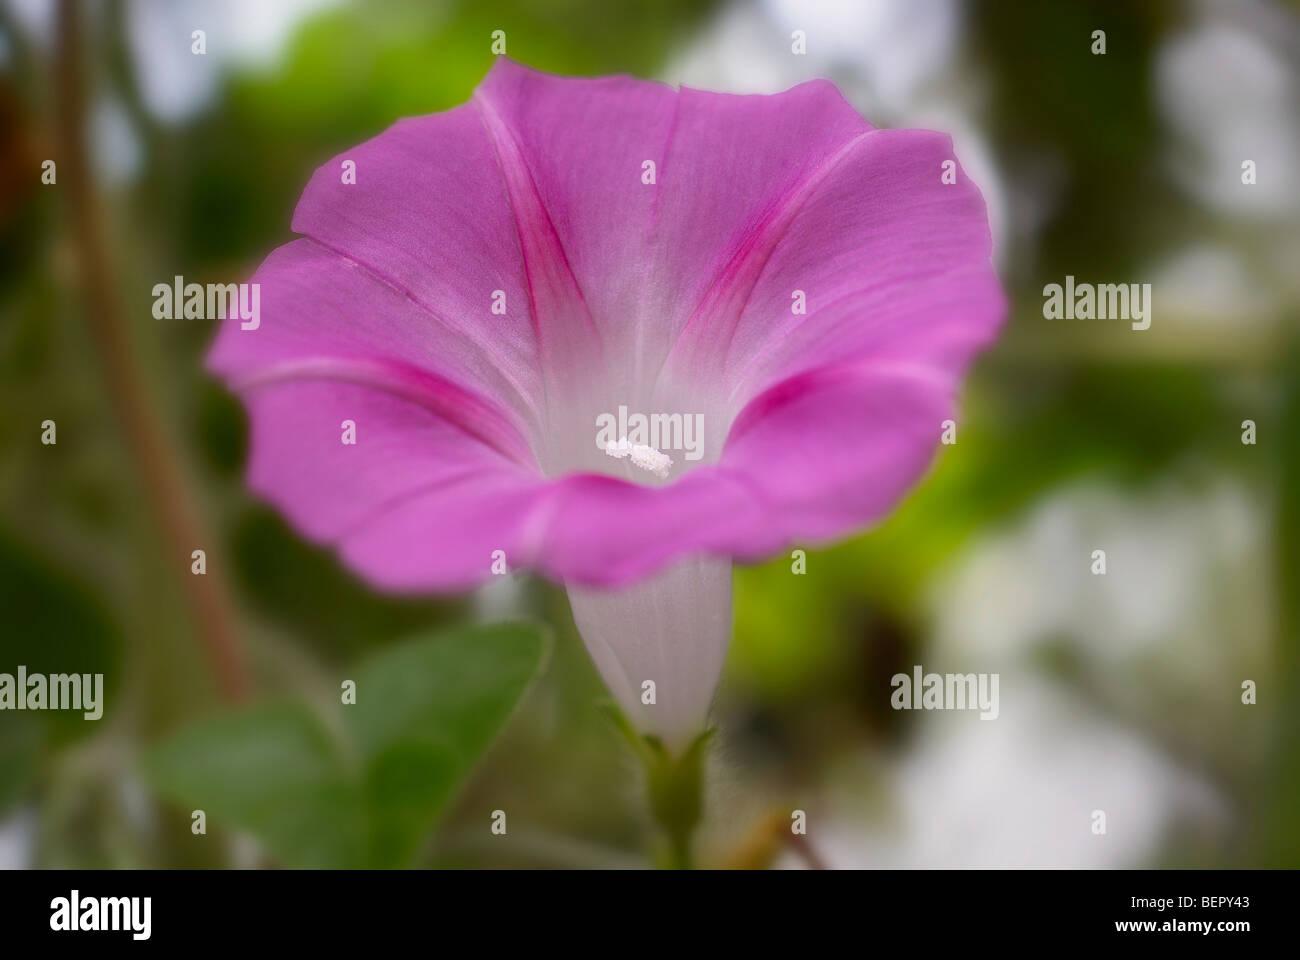 Morning glory, purple flower, purple, white, stamen, flower, flowers, creeper, close-up, close up, macro - Stock Image